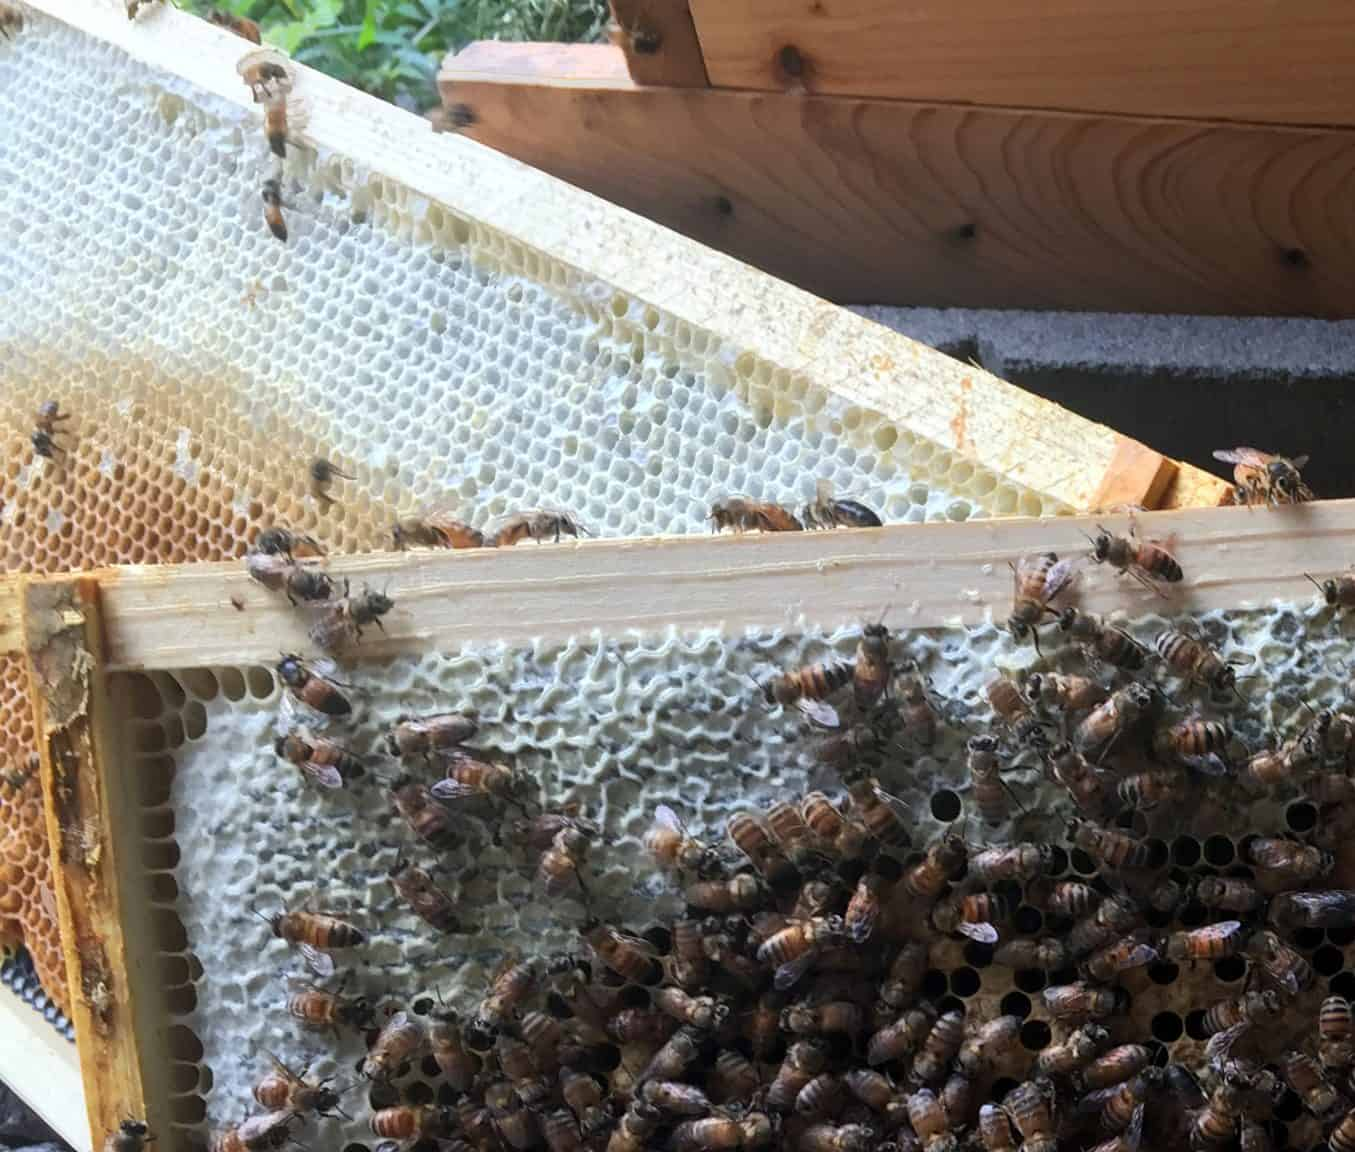 Bee Colony Growth Spurt